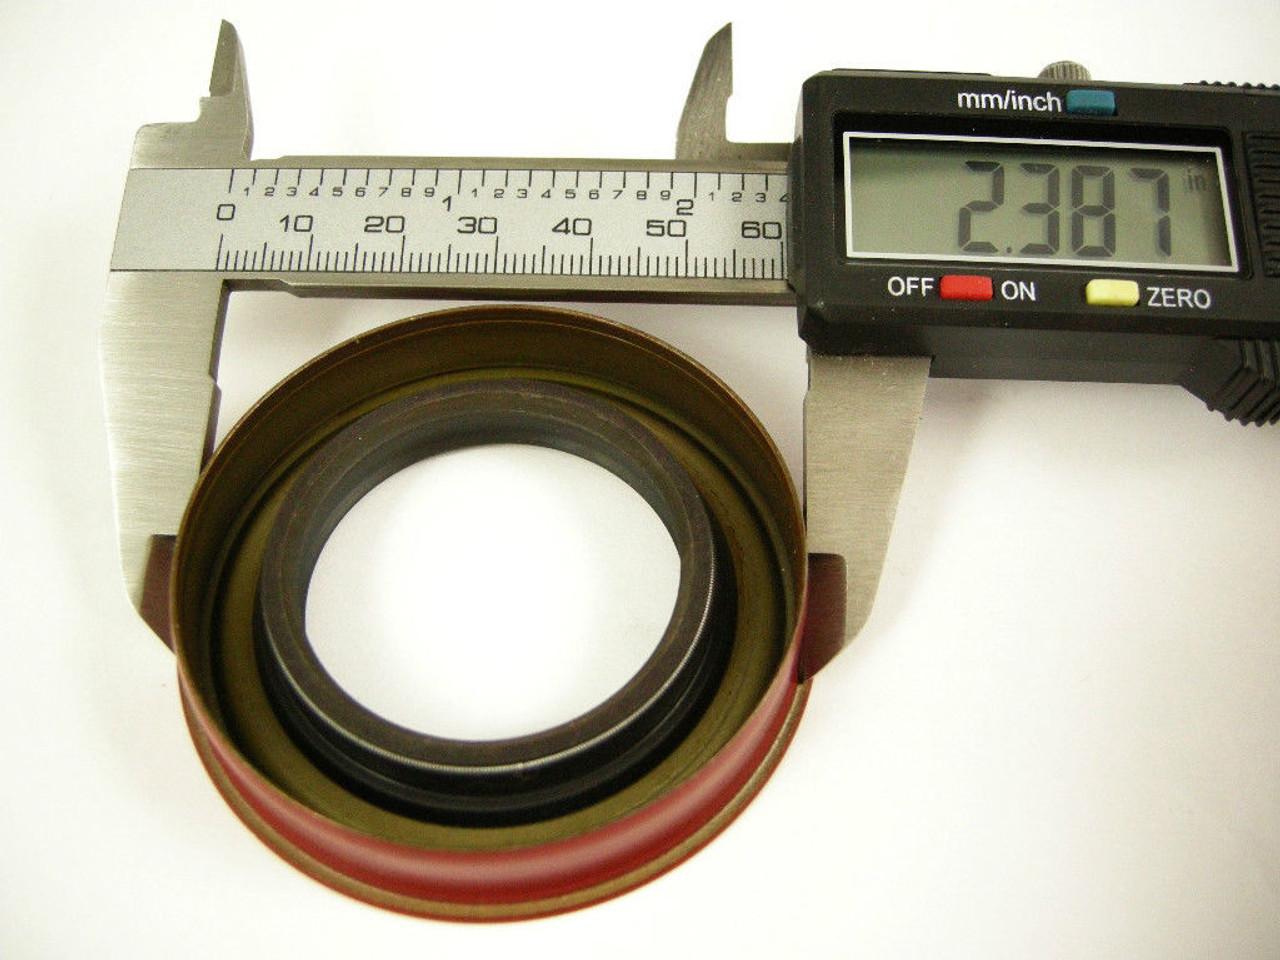 TH350 Turbo 350 Transmission Rear Extention Hsg Seal Up Kit Gasket Seal Bushing